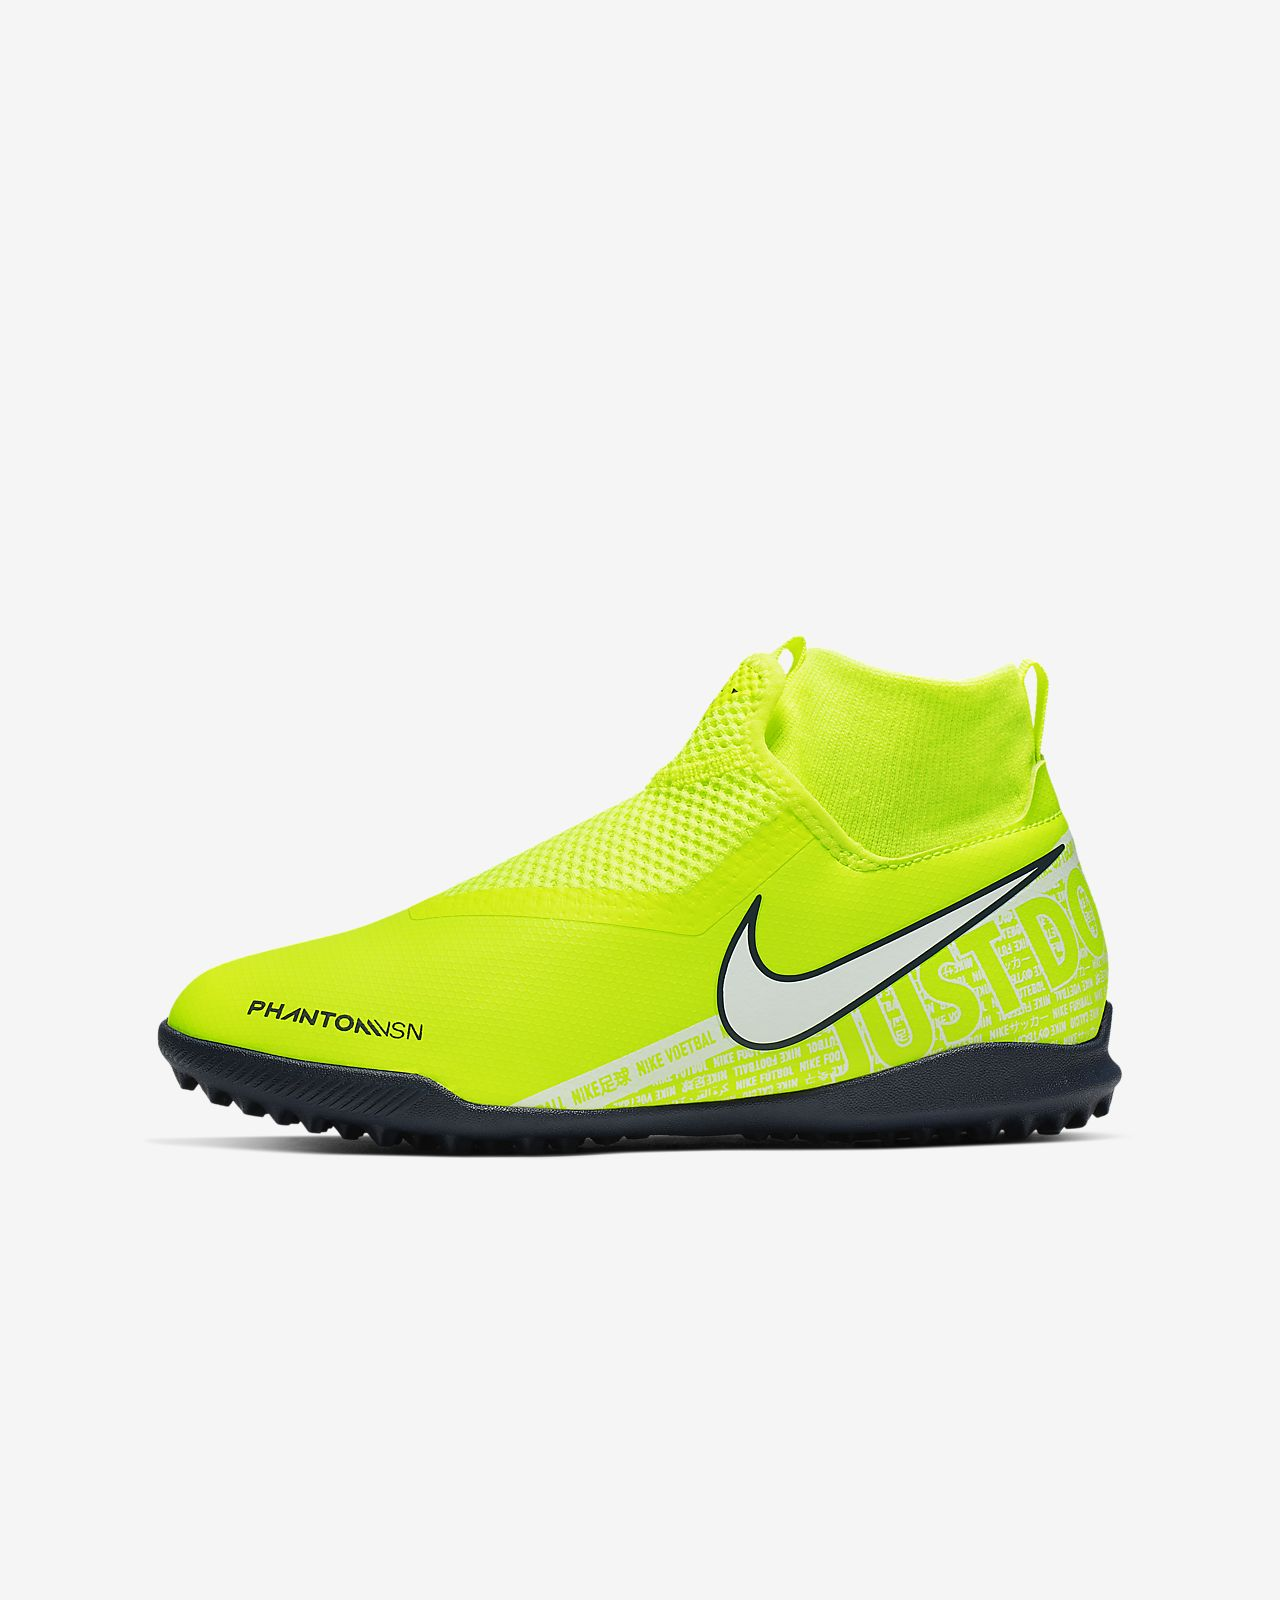 Nike Scarpe Calcio Football Hypervenom Phantom VSN Academy DF Turf Nero